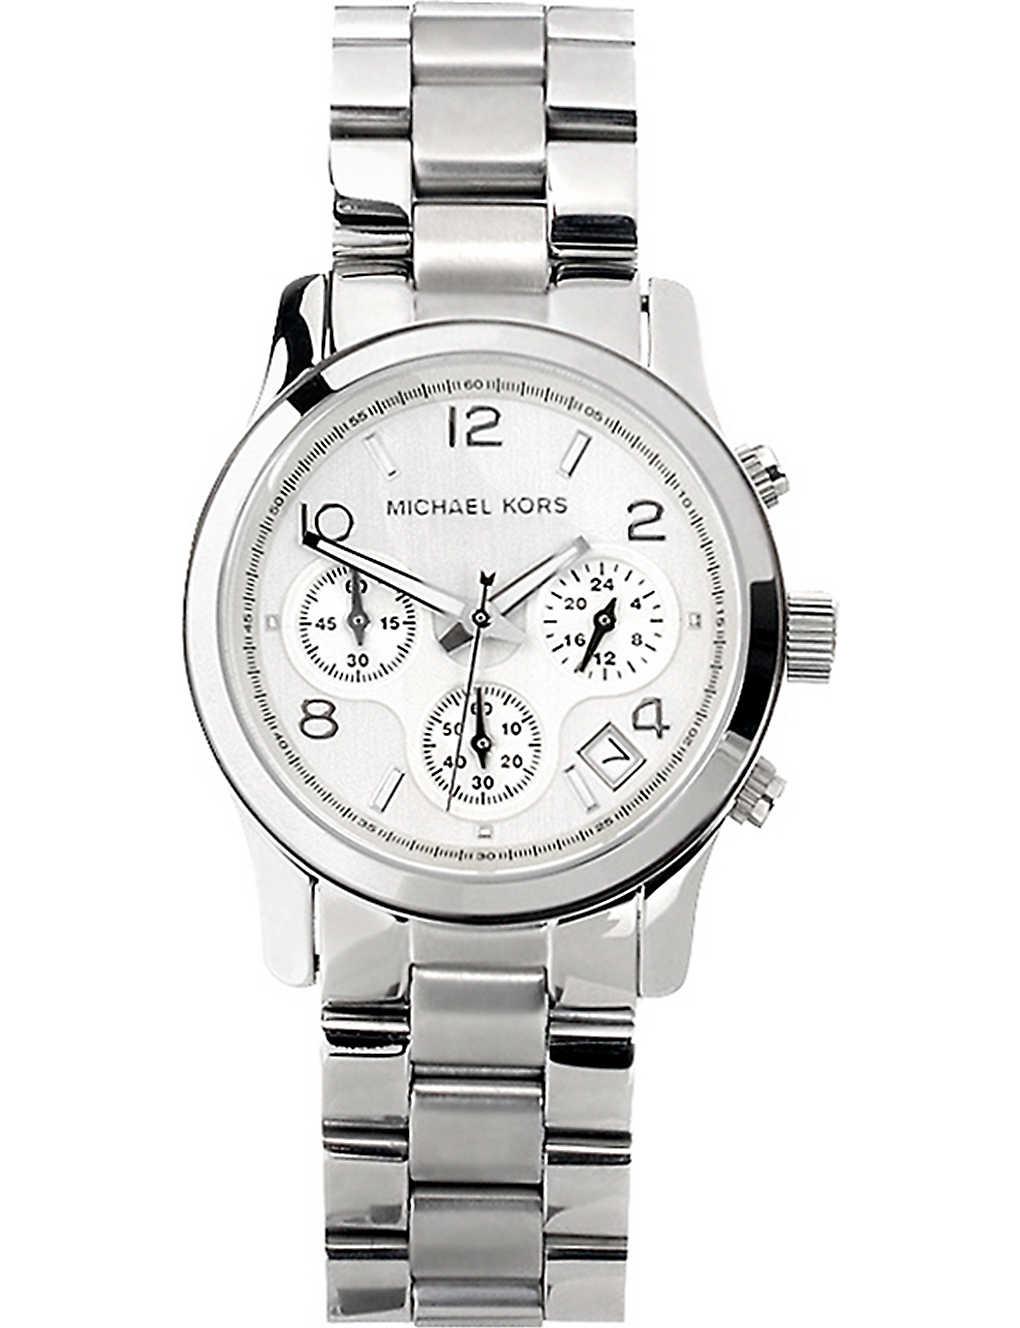 8ecb85da771 MICHAEL KORS - MK5076 Runway stainless steel watch